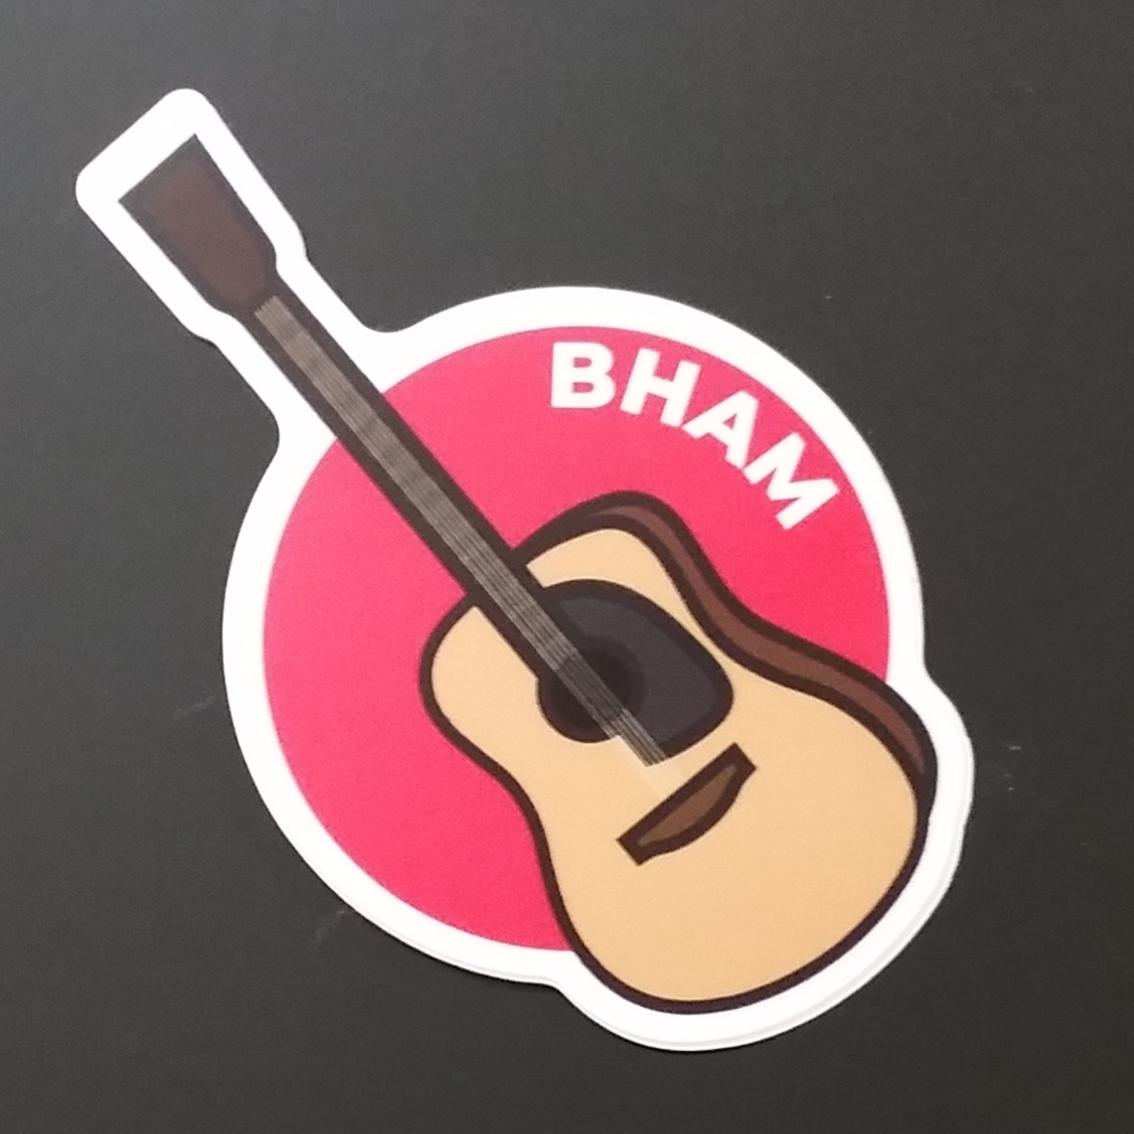 BHAM Acoustic Guitar